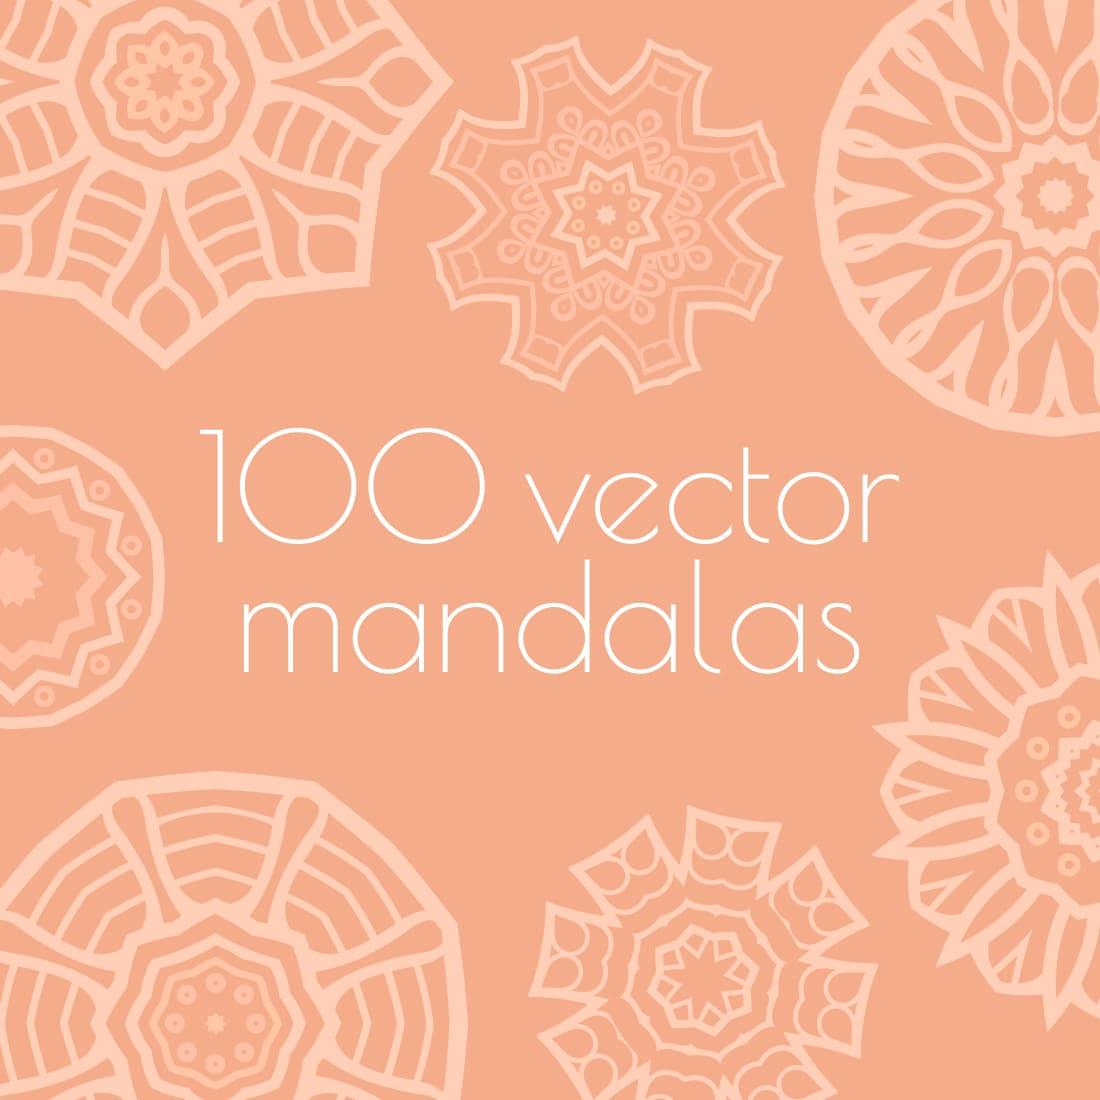 100 Free vector mandalas preview by MasterBundles.